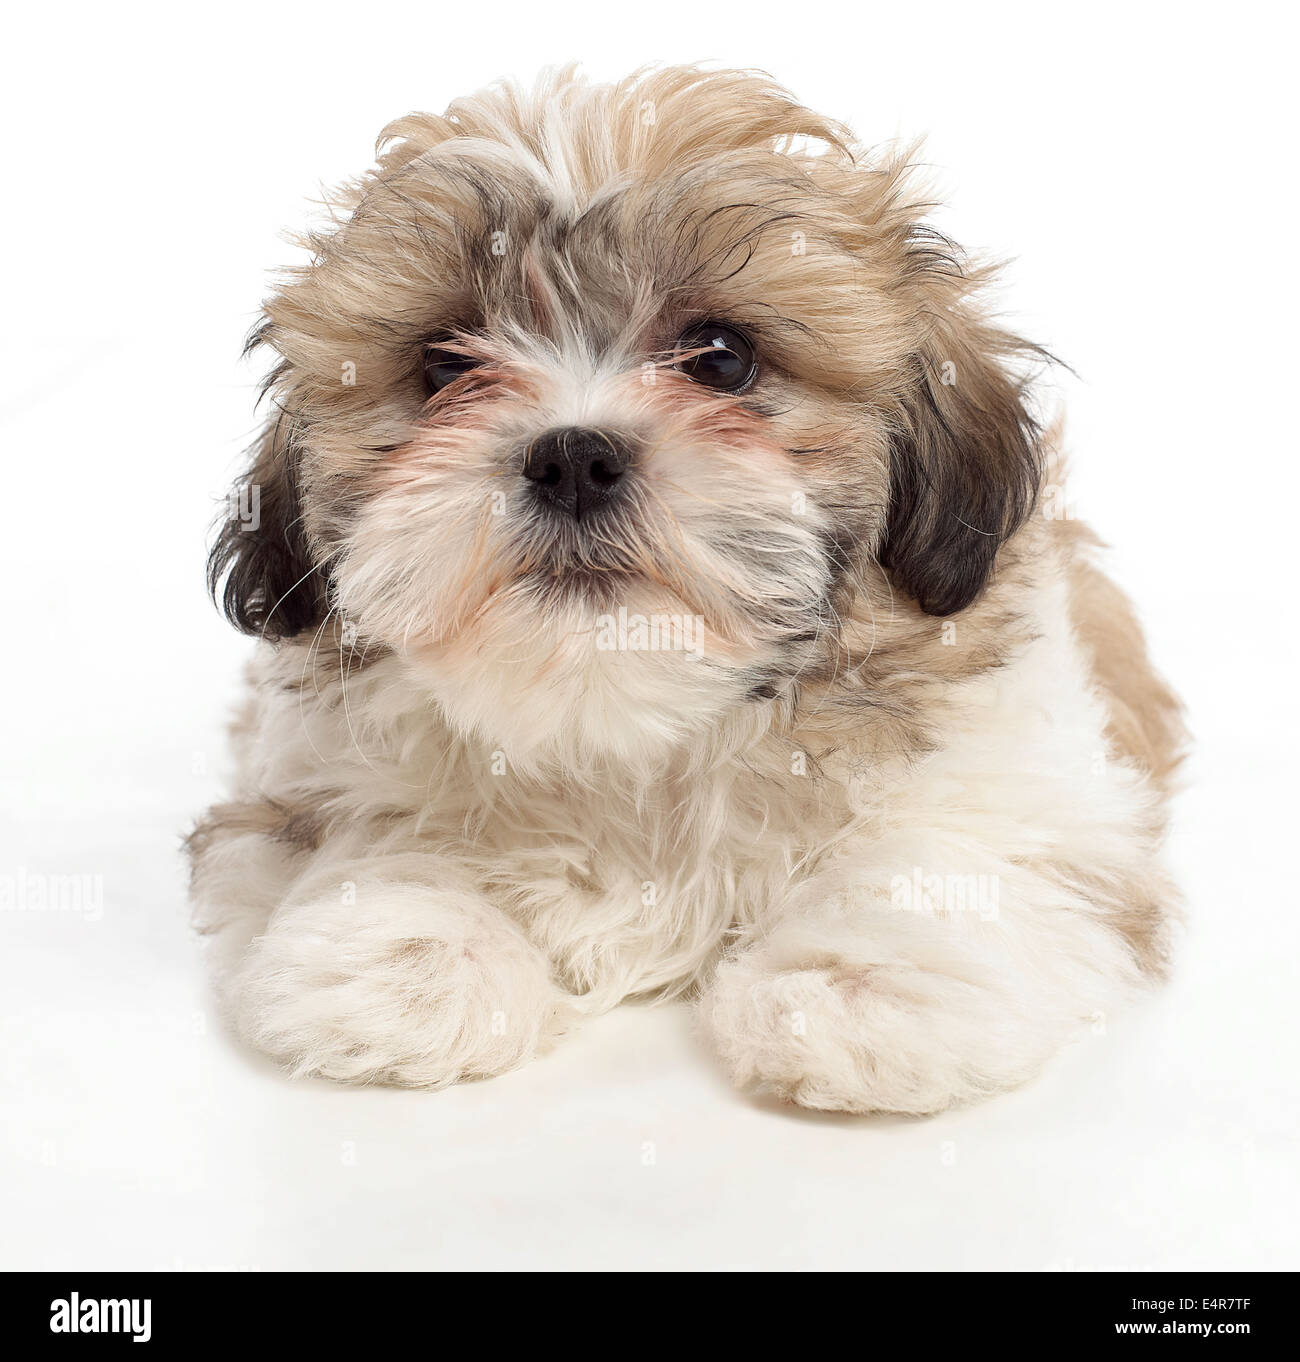 Shih Tzu Puppy 8 Week Old Stock Photo 71811167 Alamy